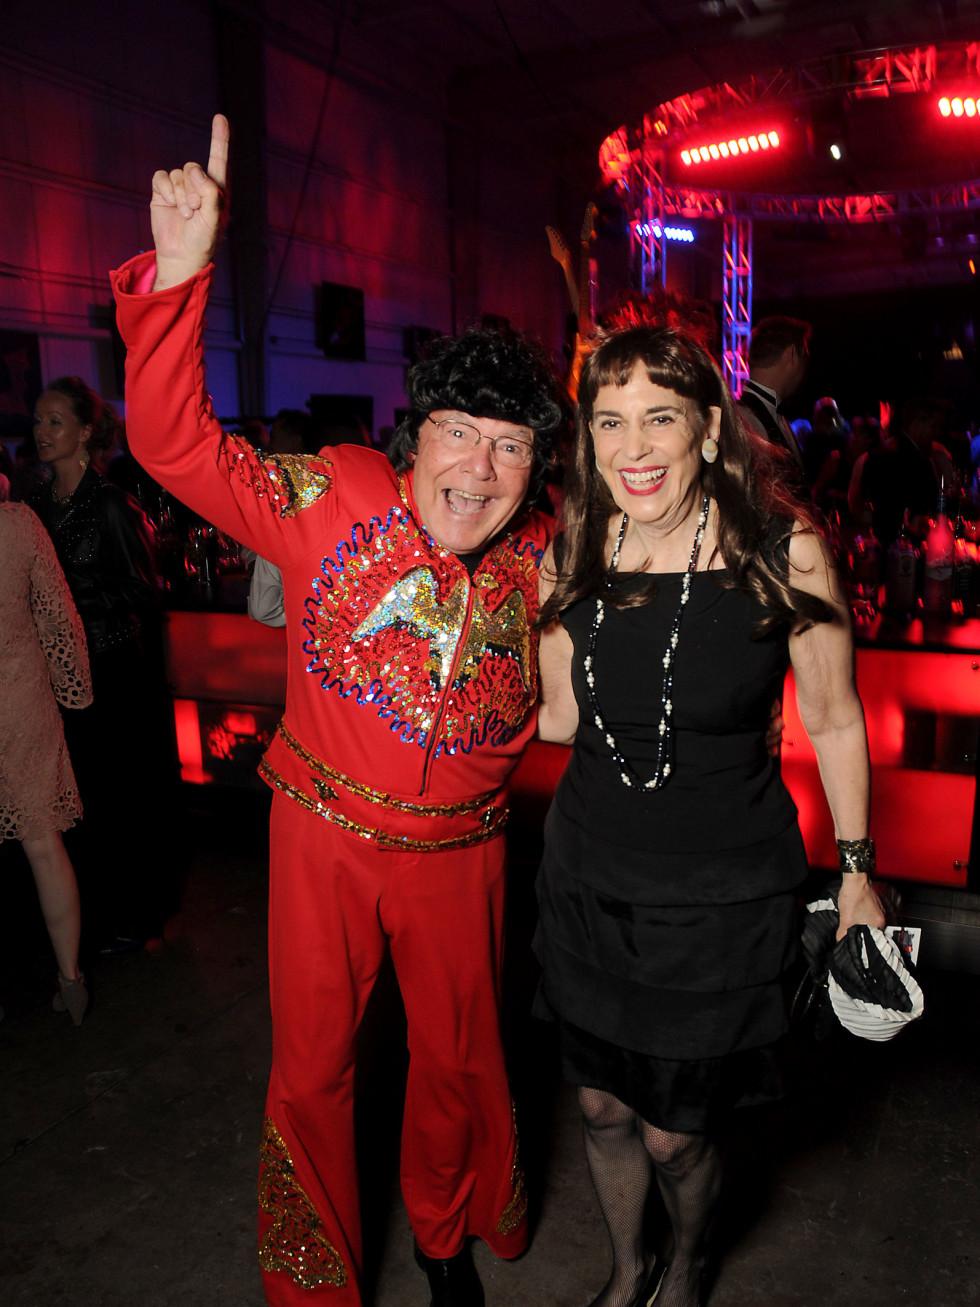 Alley Gala 4/2016, George Stark, Lois Stark